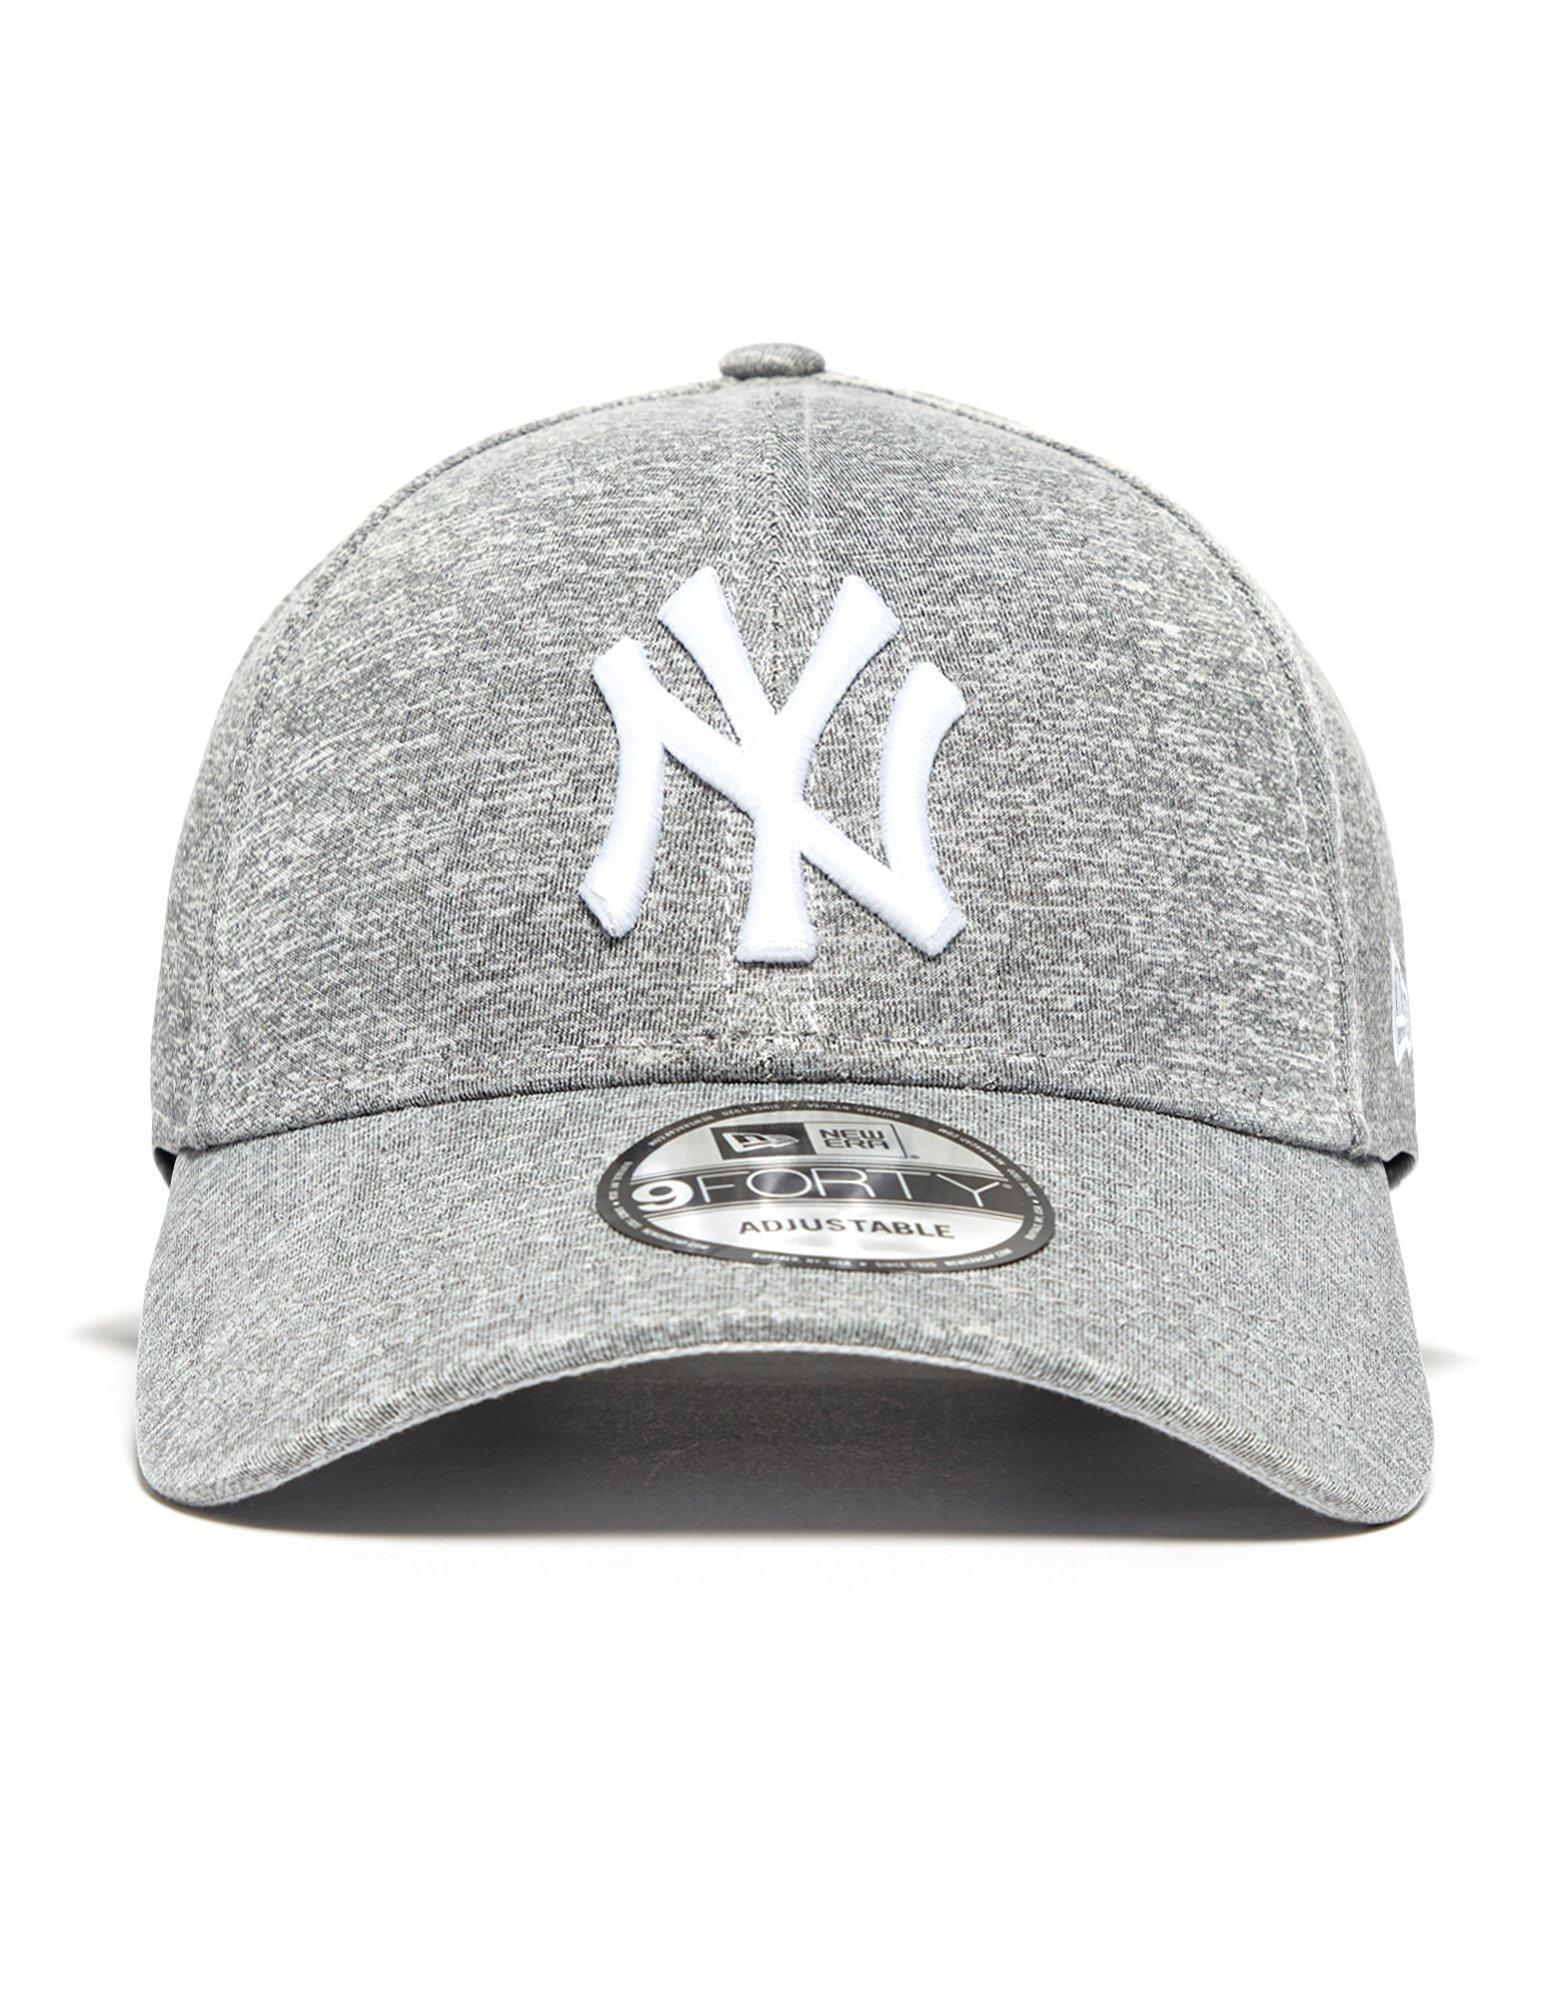 30f4d4dc0e2f9 KTZ New York Yankees Tech Jersey 9forty Cap in Gray for Men - Lyst